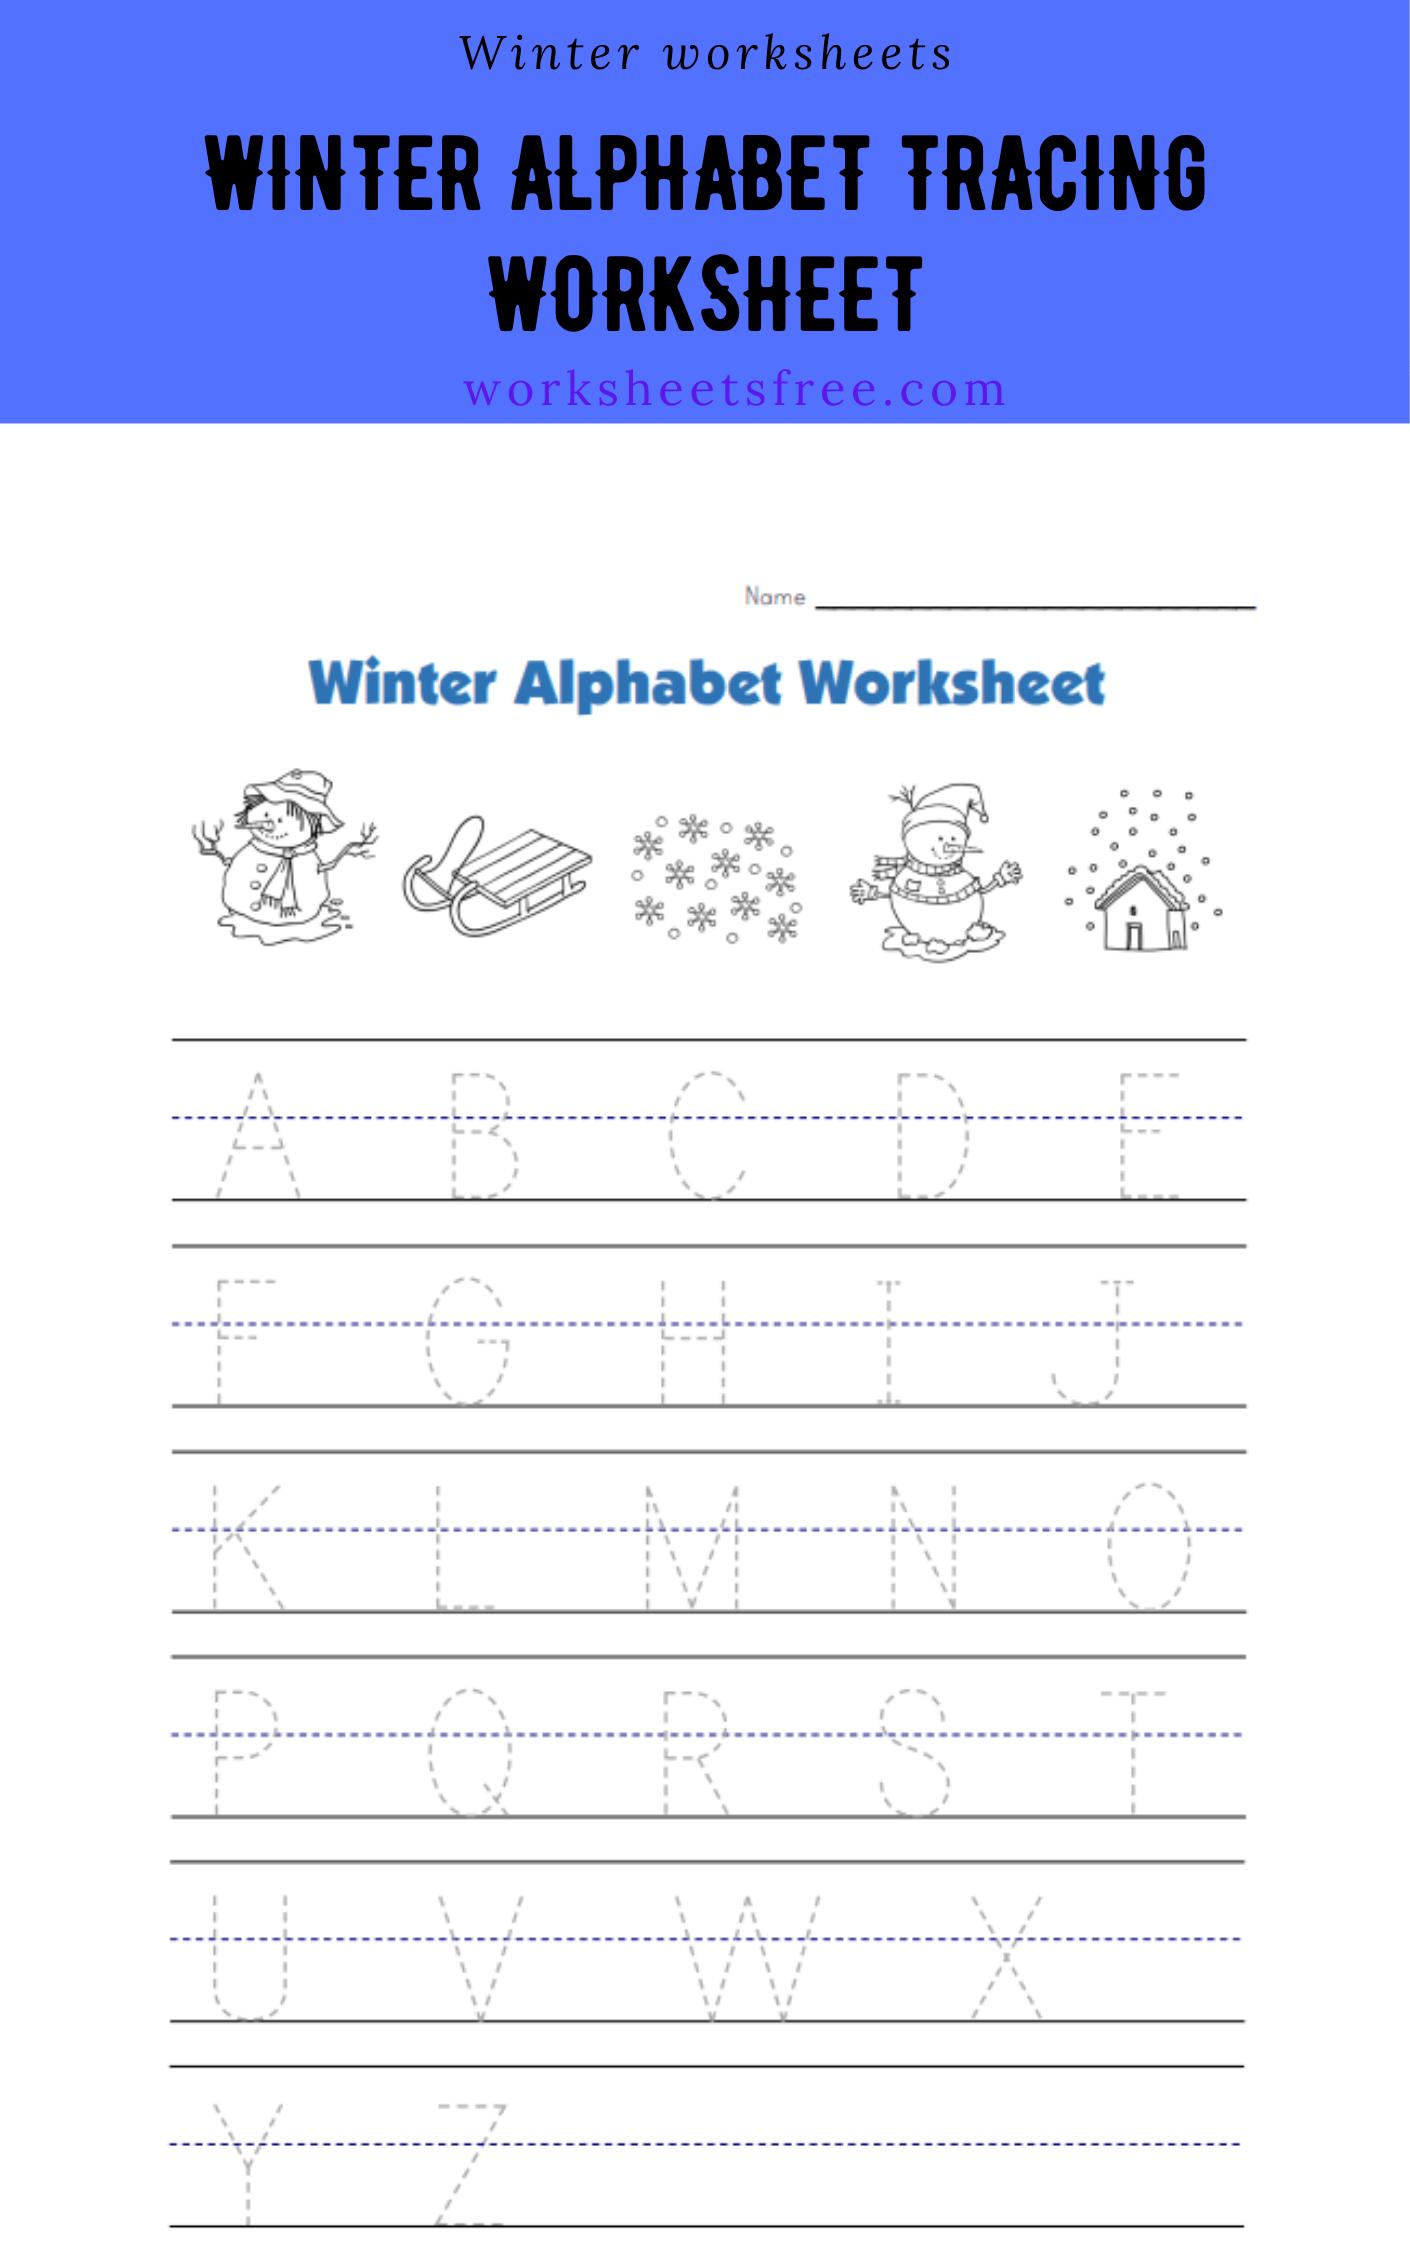 Winter Alphabet Tracing Worksheet